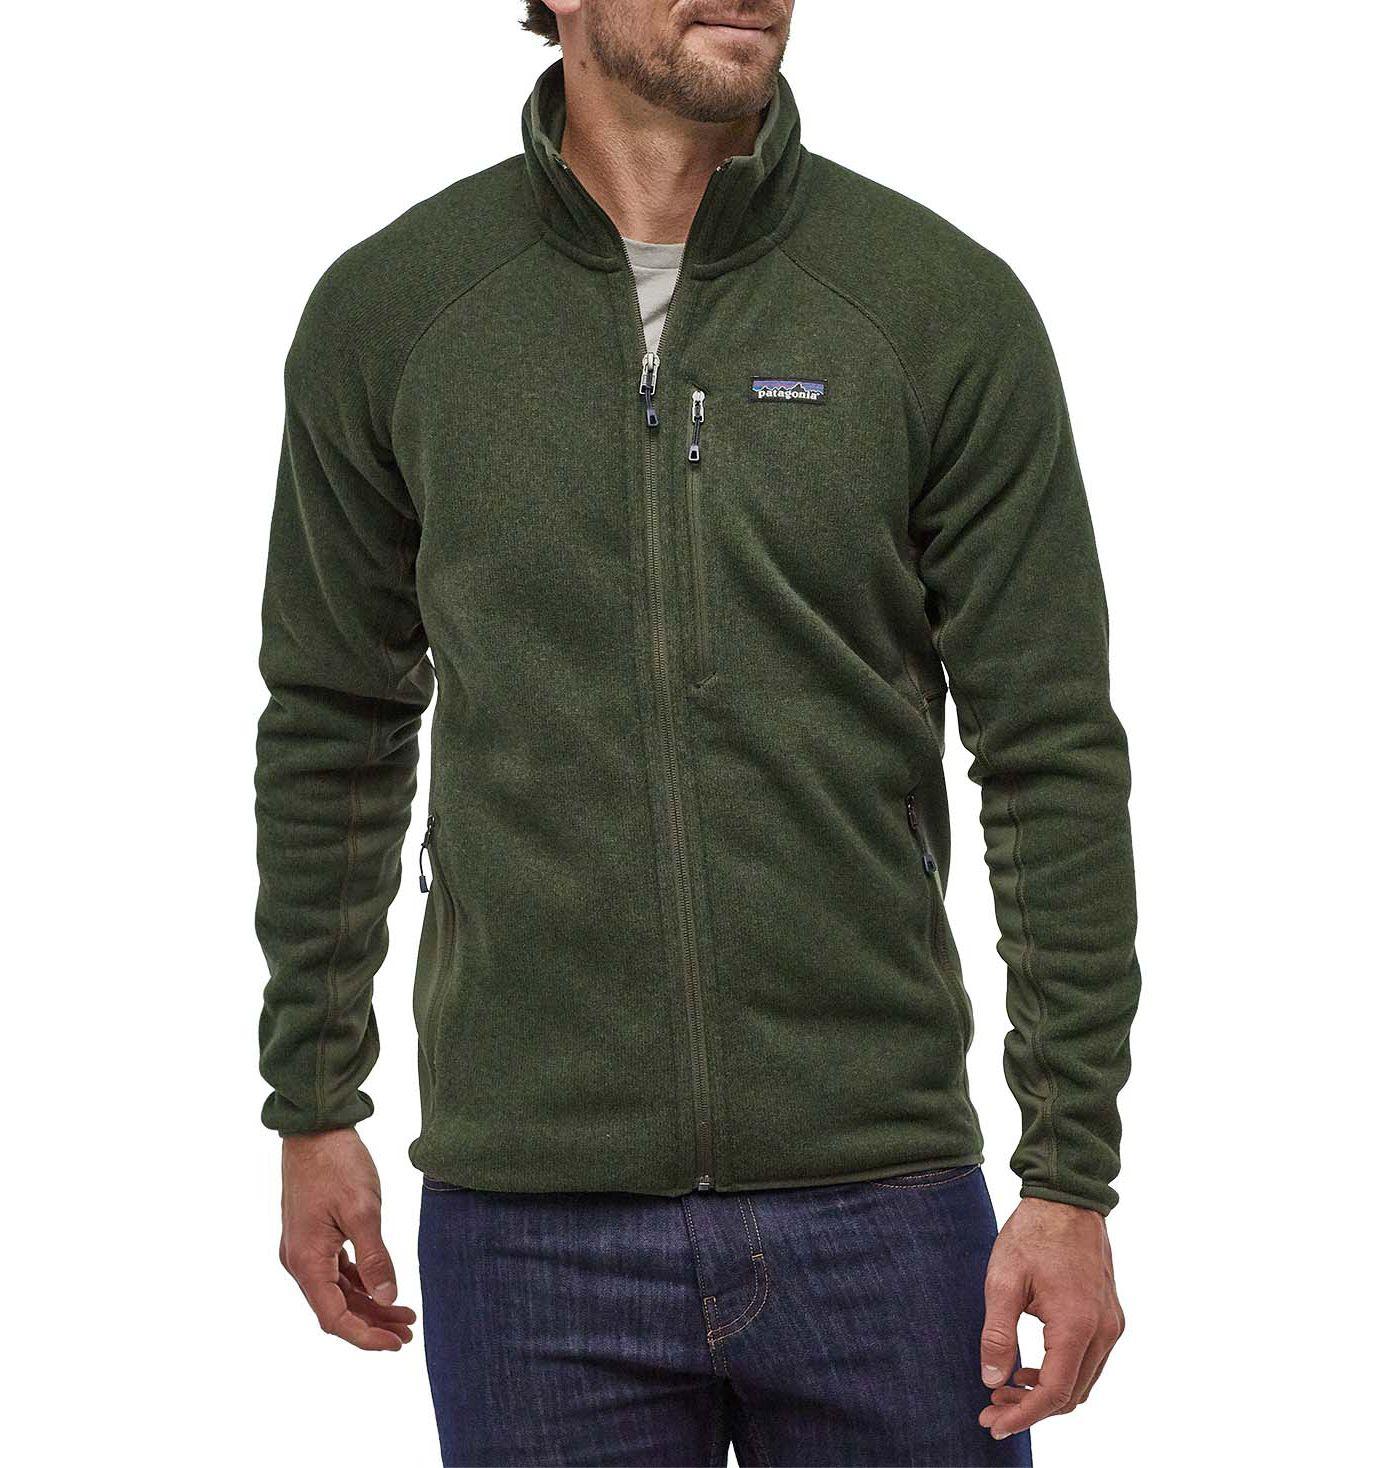 Patagonia Men's Performance Better Sweater Fleece Jacket